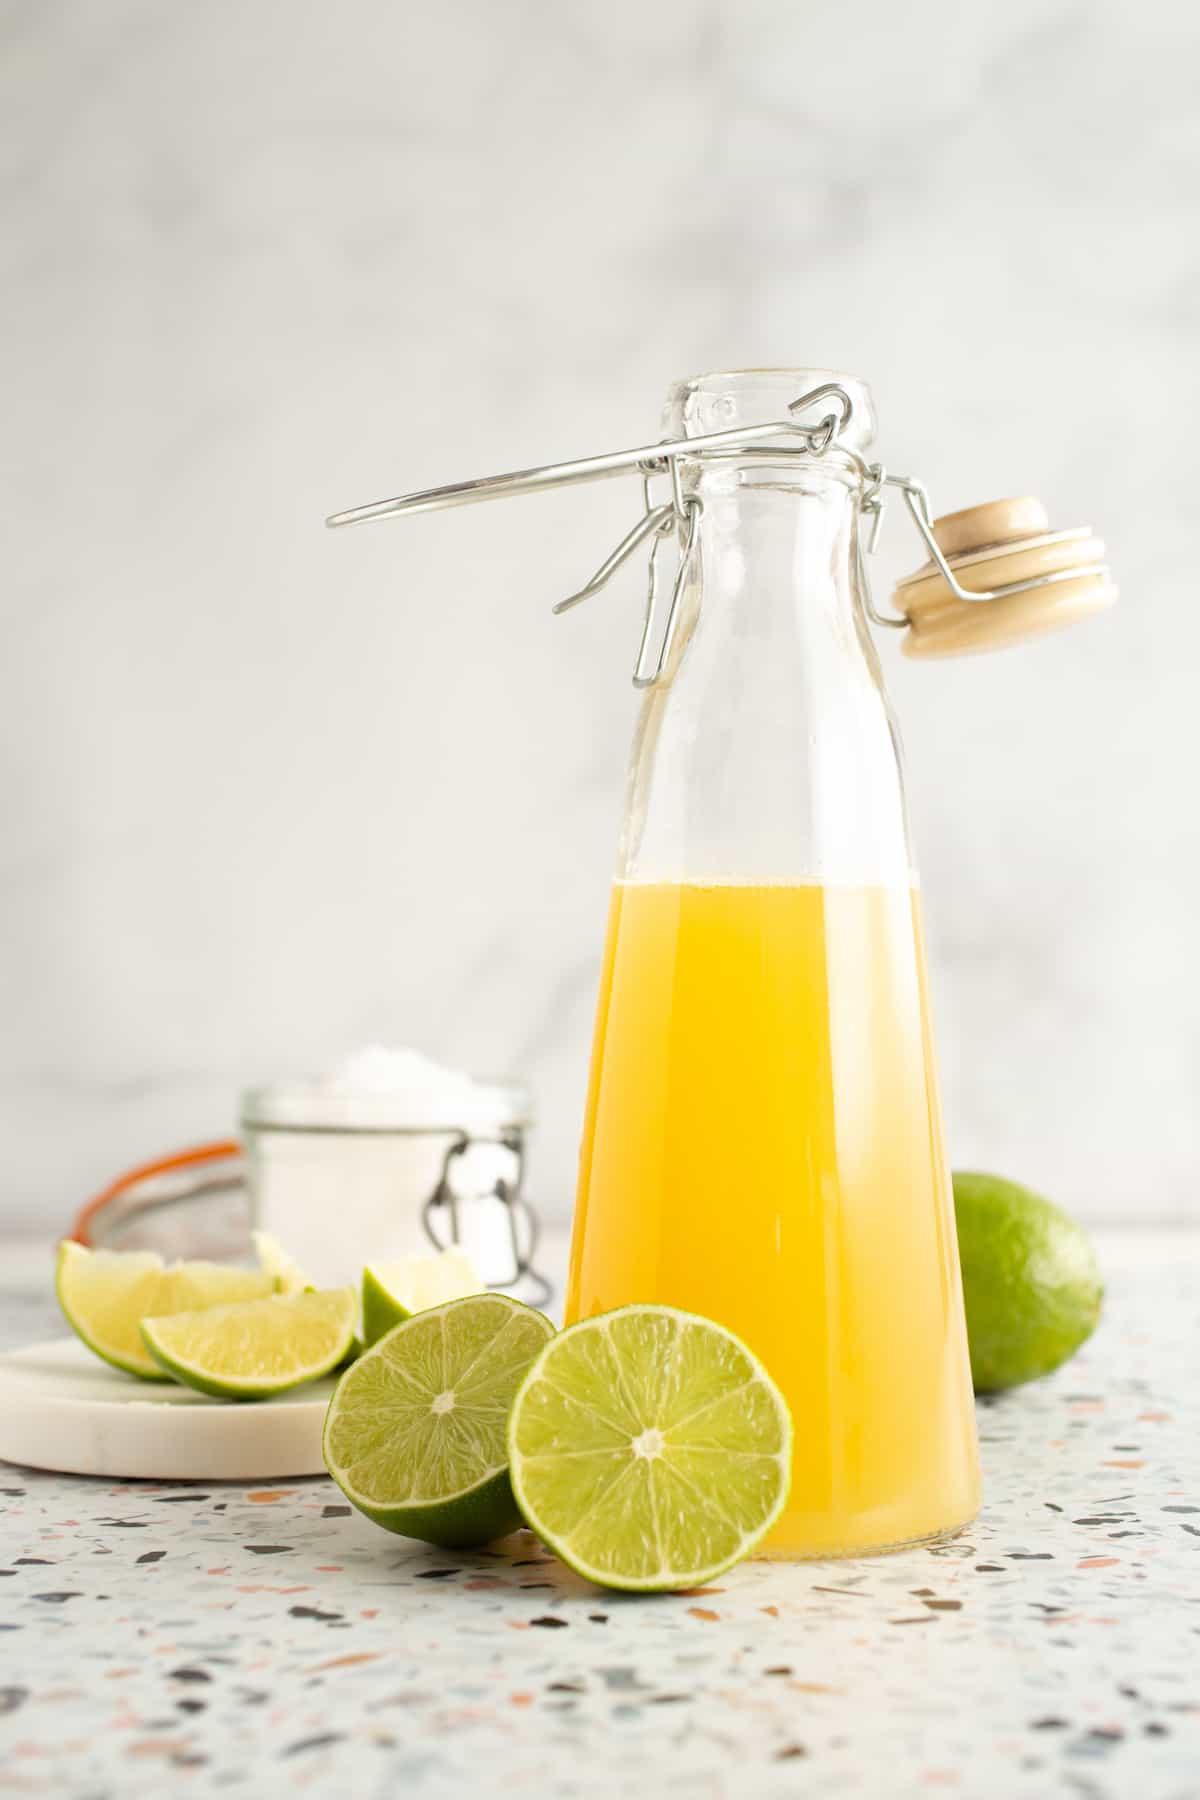 Lime-Sea Salt Soda Syrup from The Artisan Soda Workshop